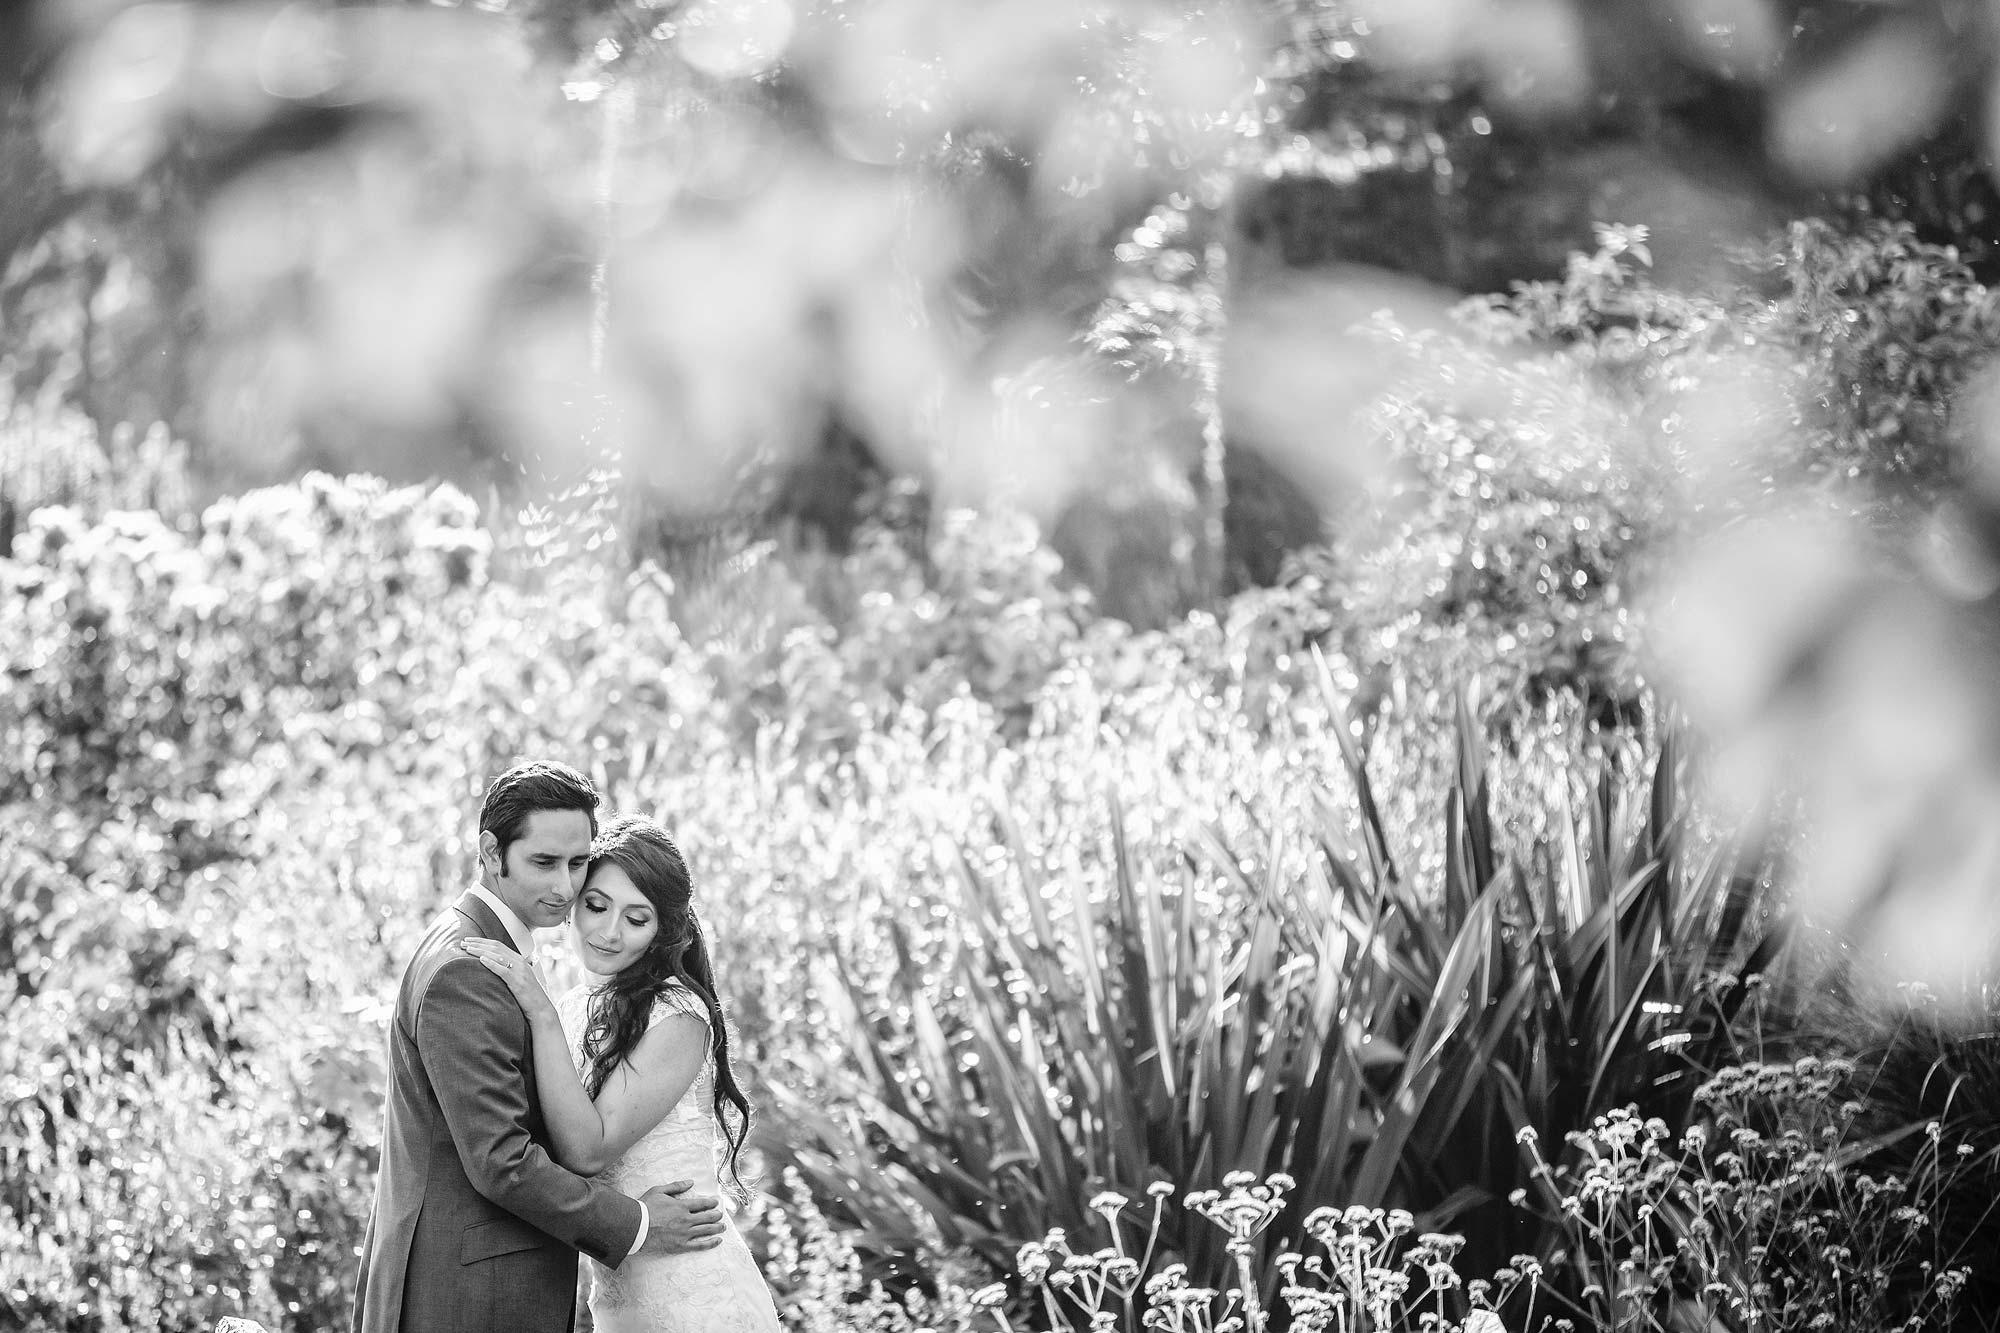 Wedding Reshoot at Orangery Maidstone